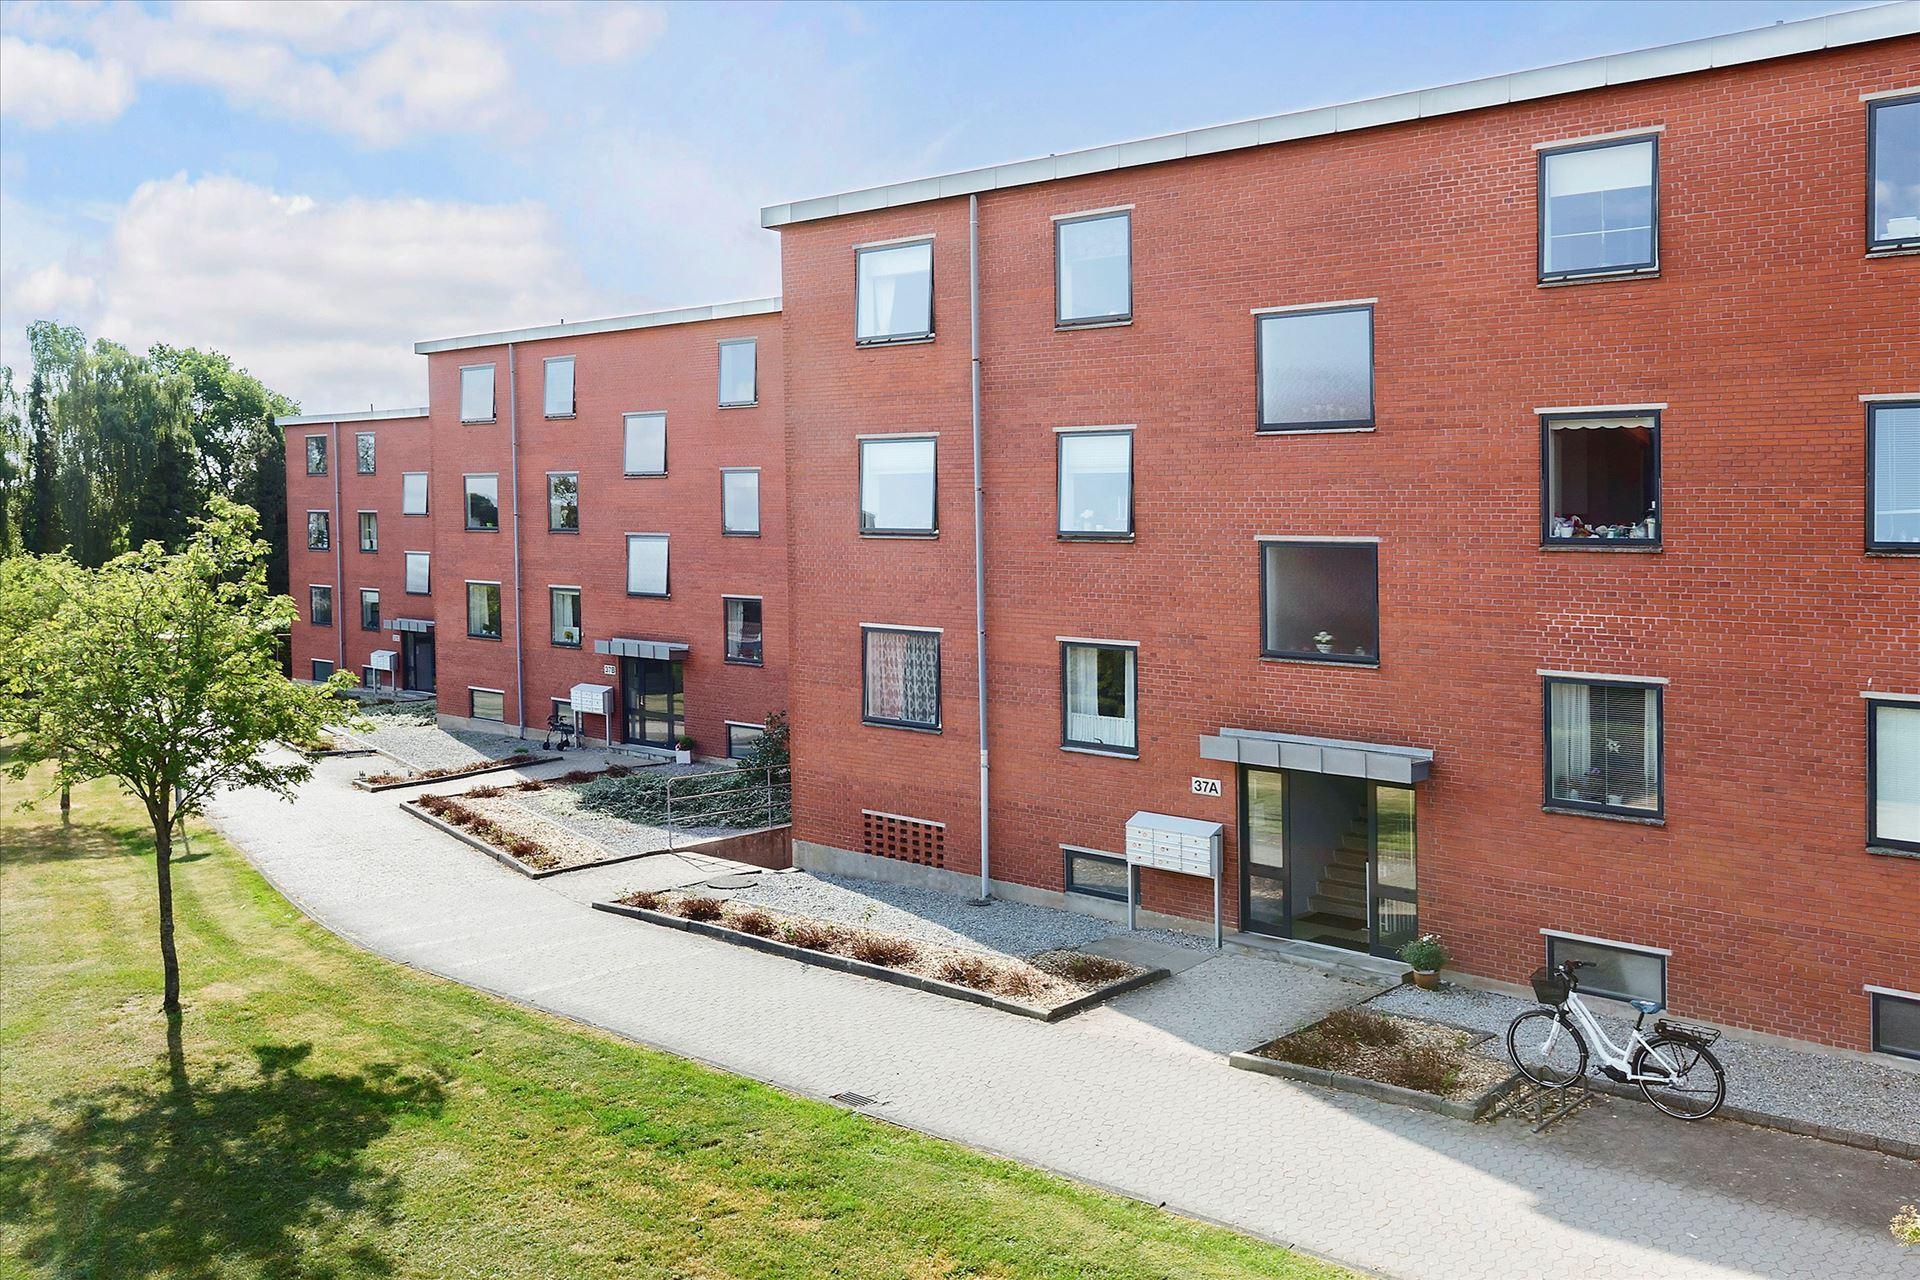 Asser Rigs Vej 37A, ST. MF, Kristrup, 8960 Randers SØ